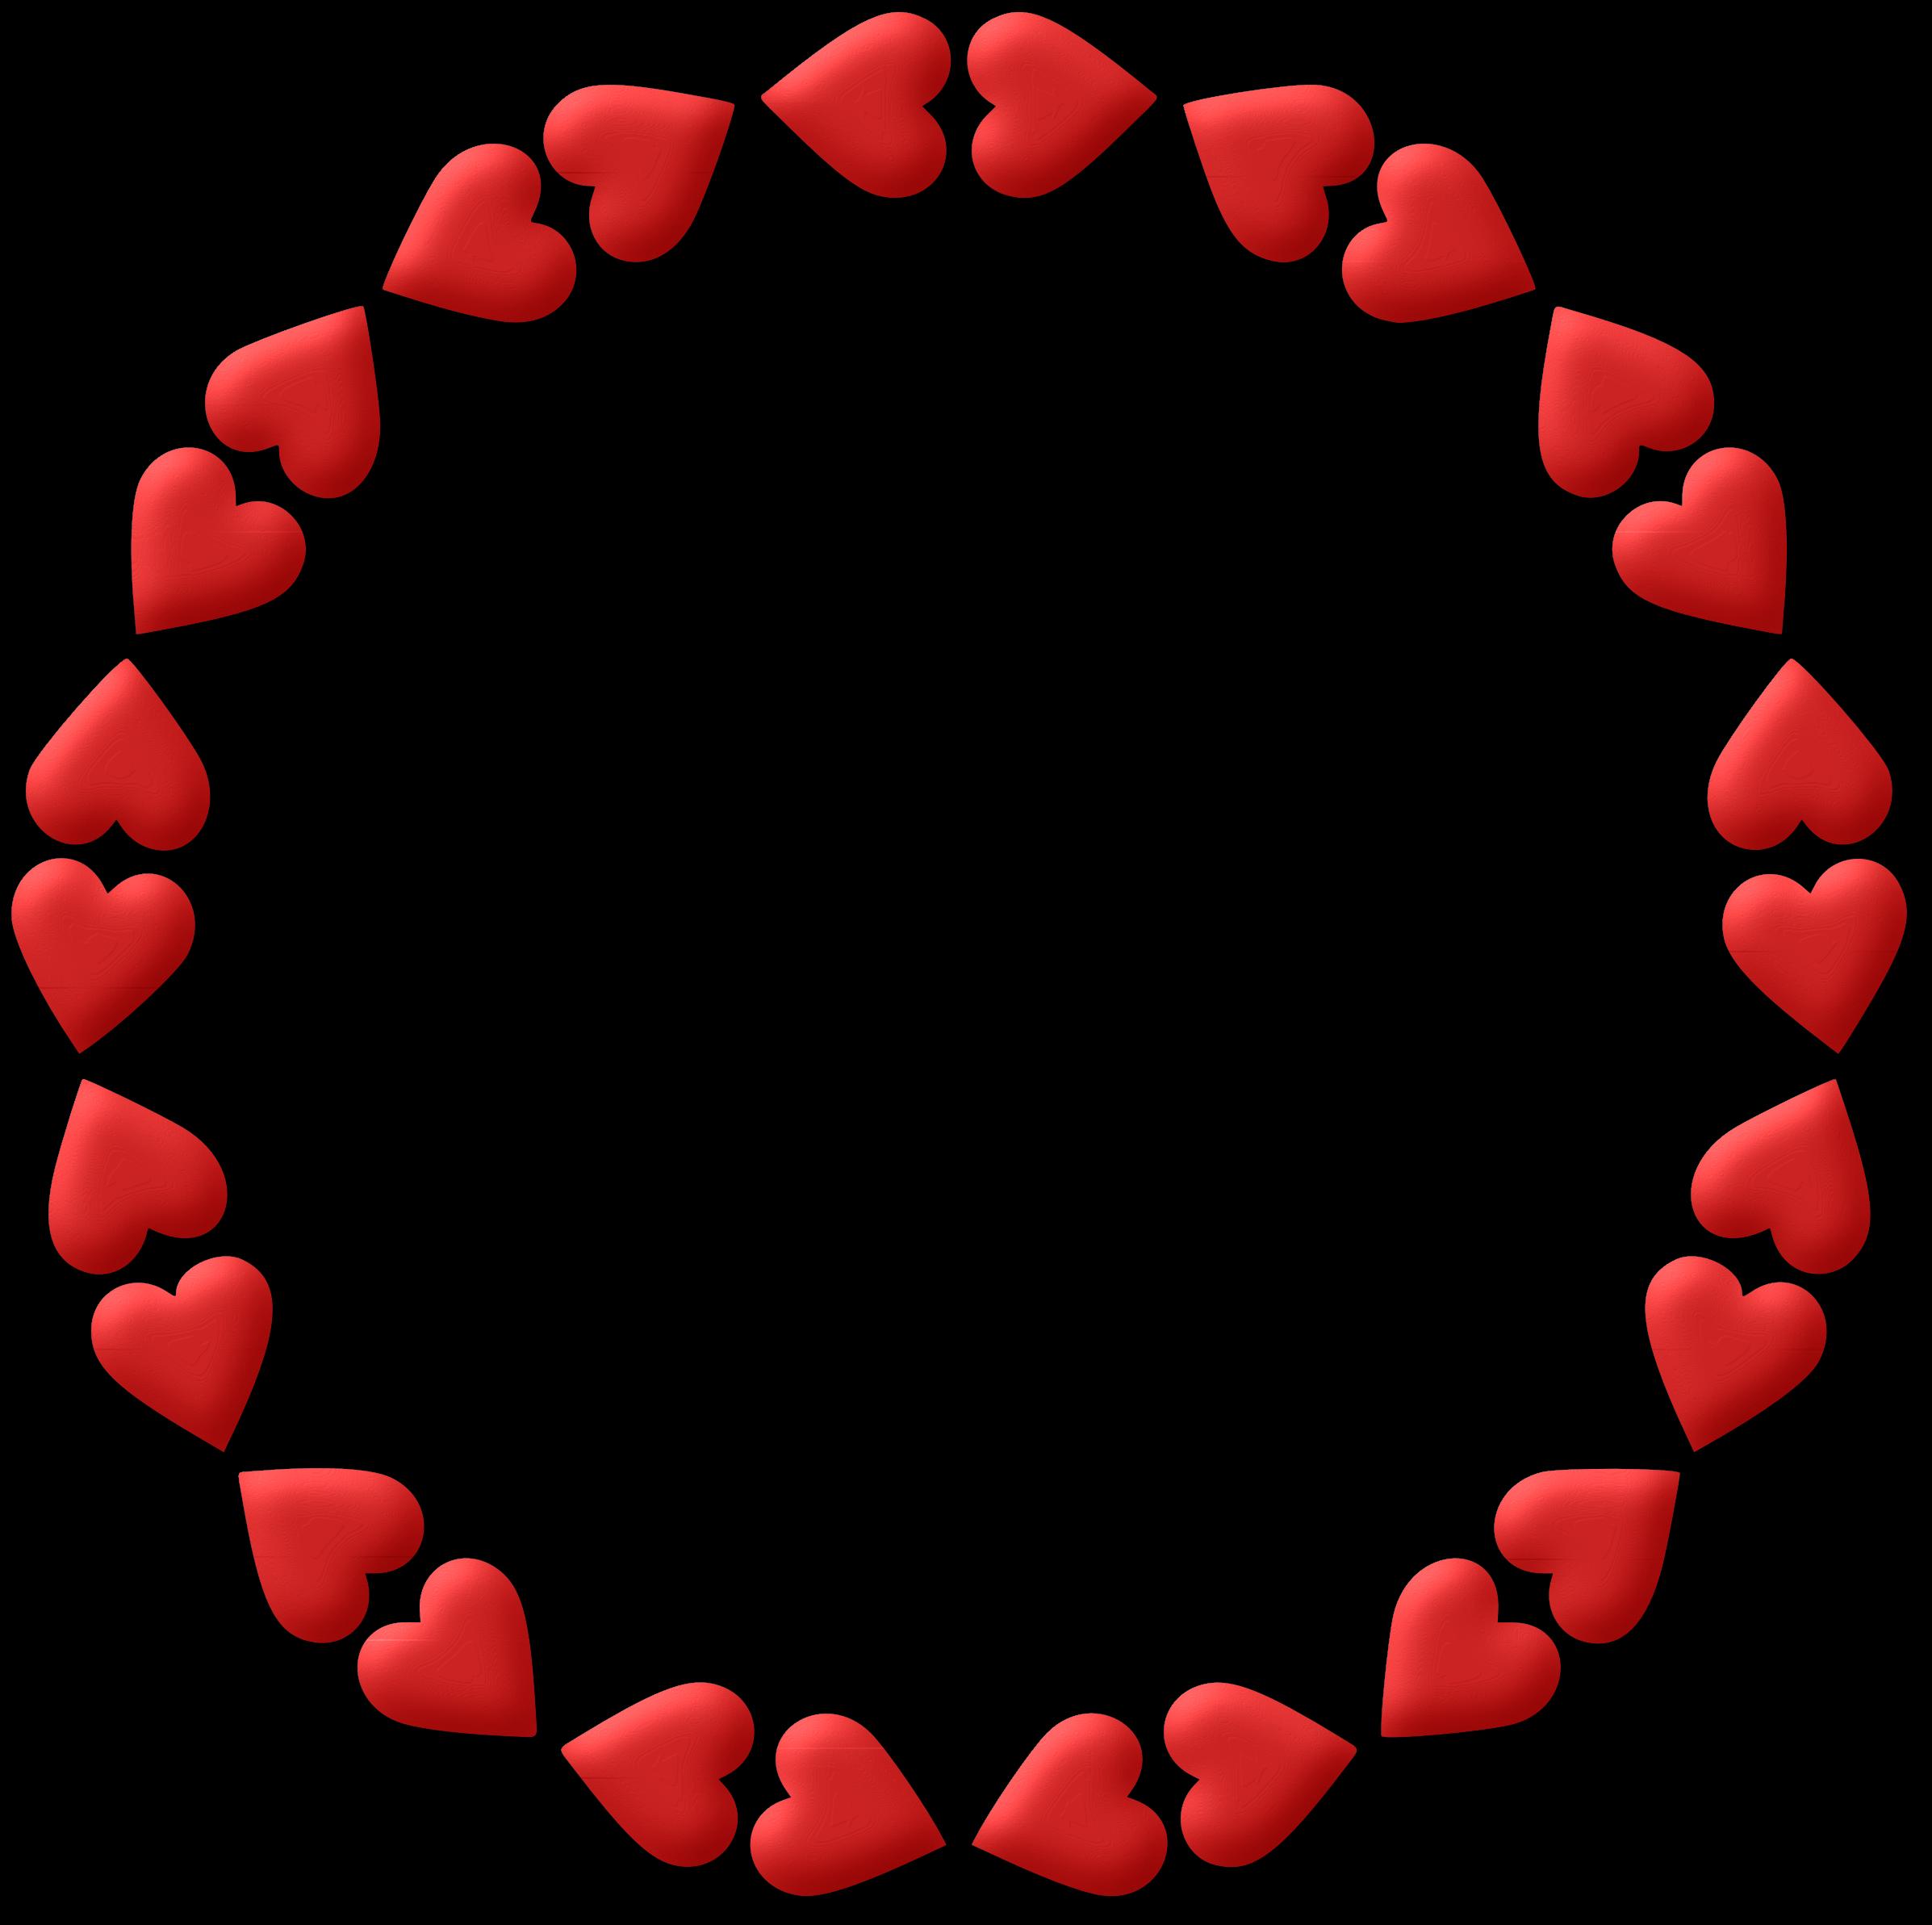 Heart Frame New Red Clip Art at Clker.com - vector clip art online, royalty  free & public domain